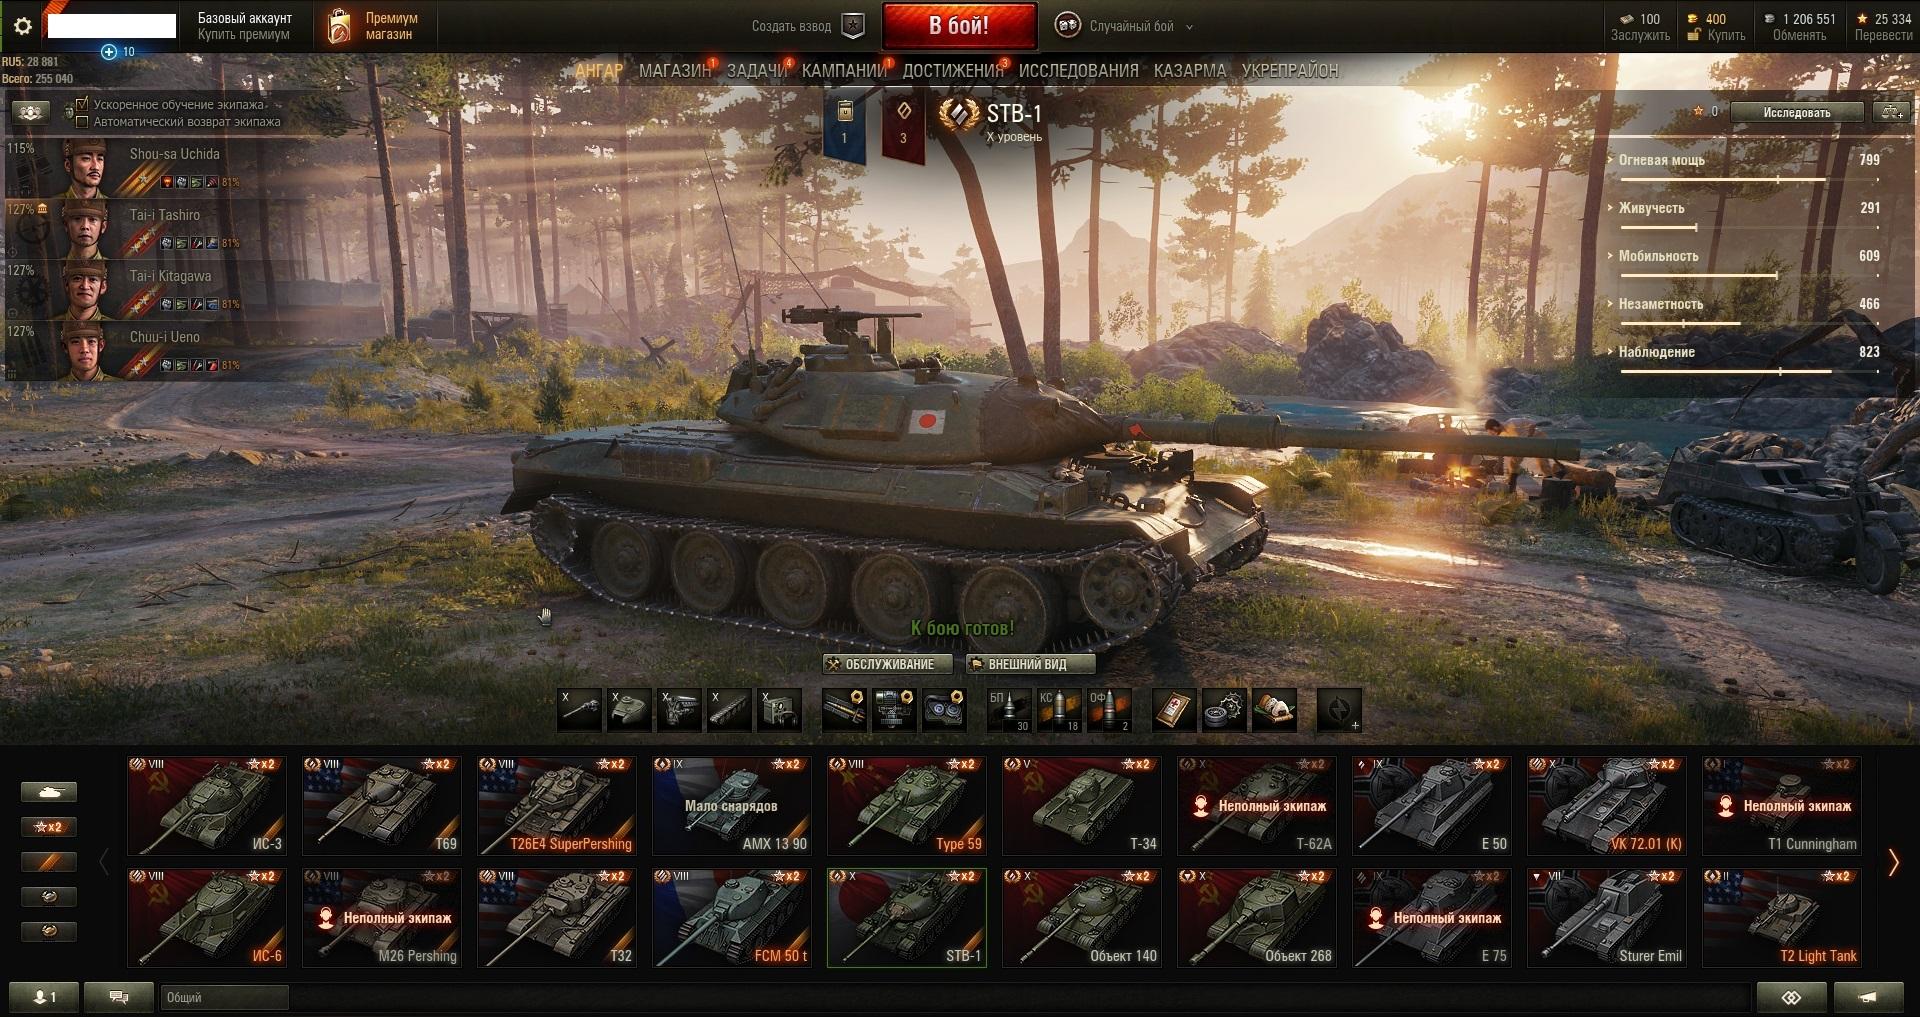 World of Tanks Аккаунт с топами и привязками №04